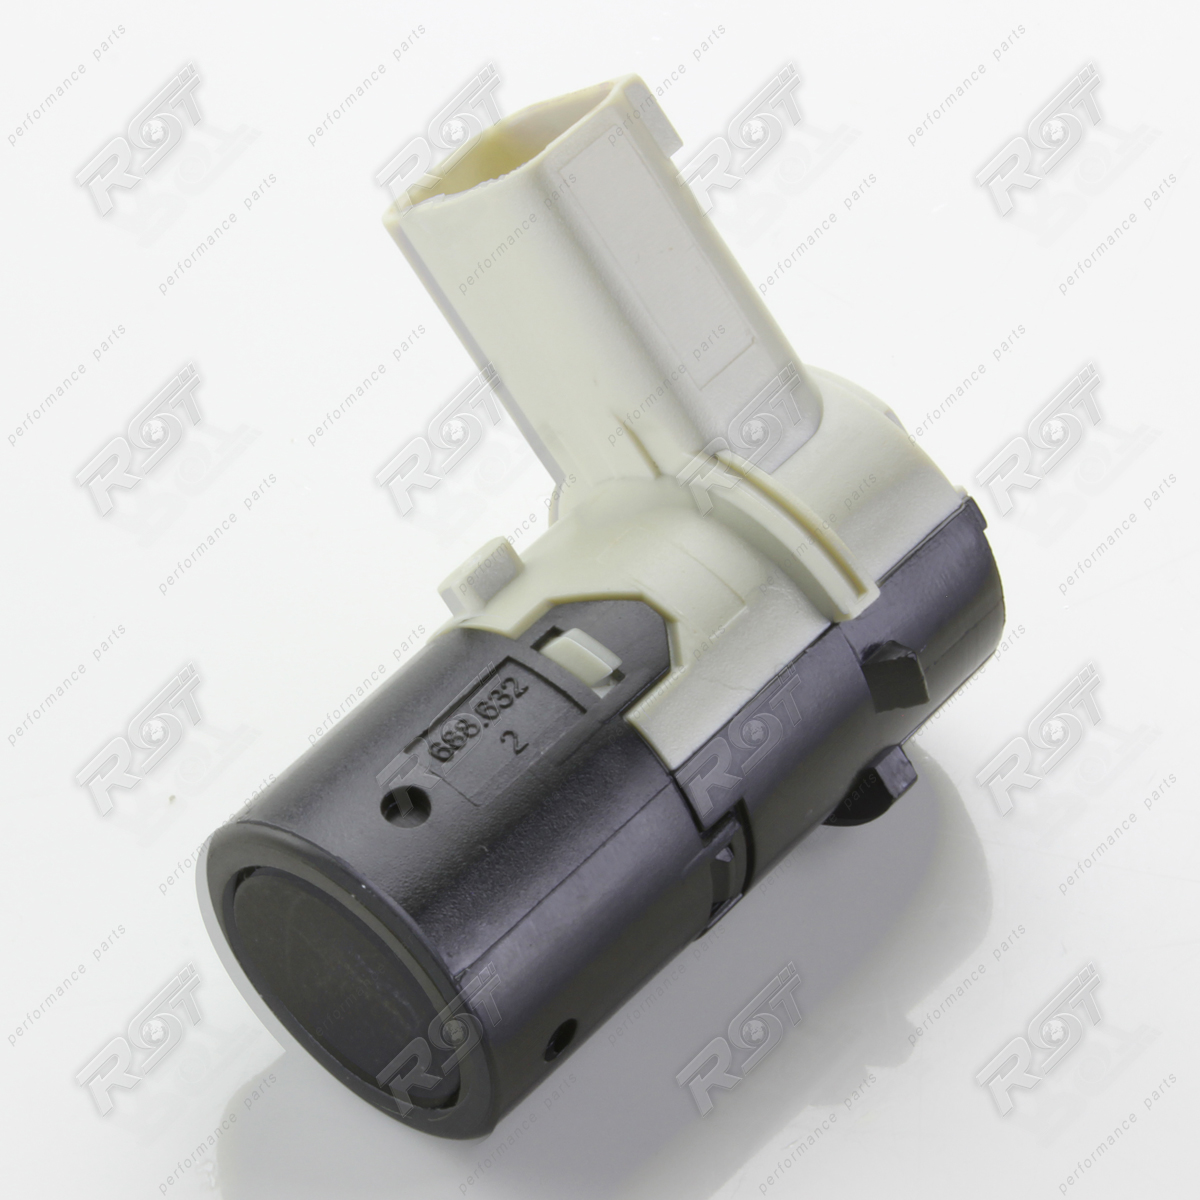 Bmw mercedes benz pdc parking aid sensor ultrasonic front for Mercedes benz parking sensors